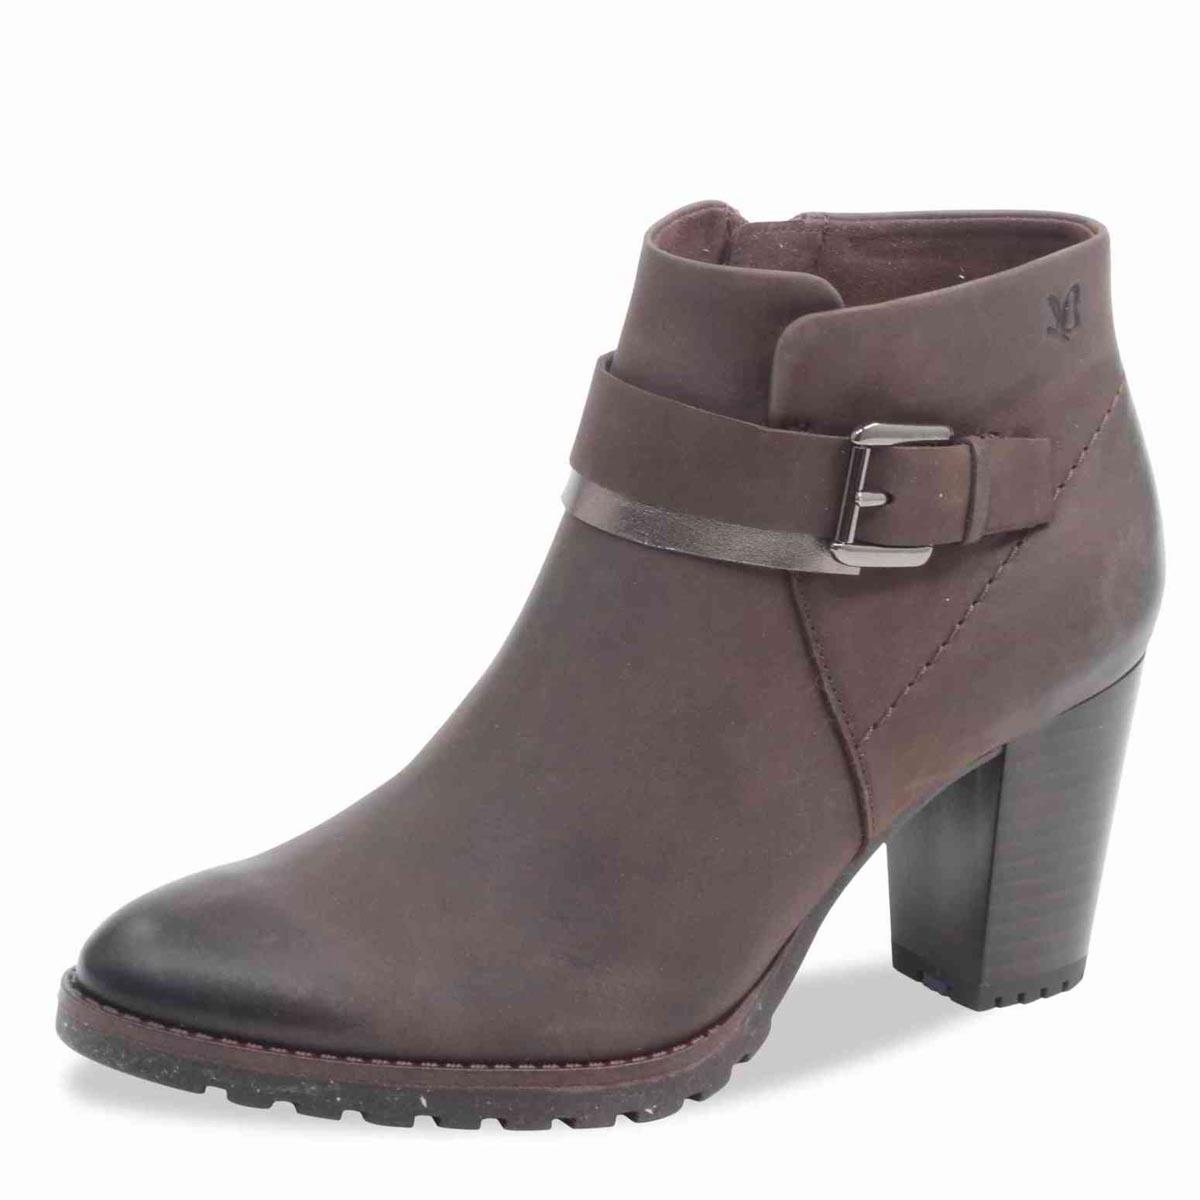 Caprice - Carmela Brown Nubuck Ankle Boot